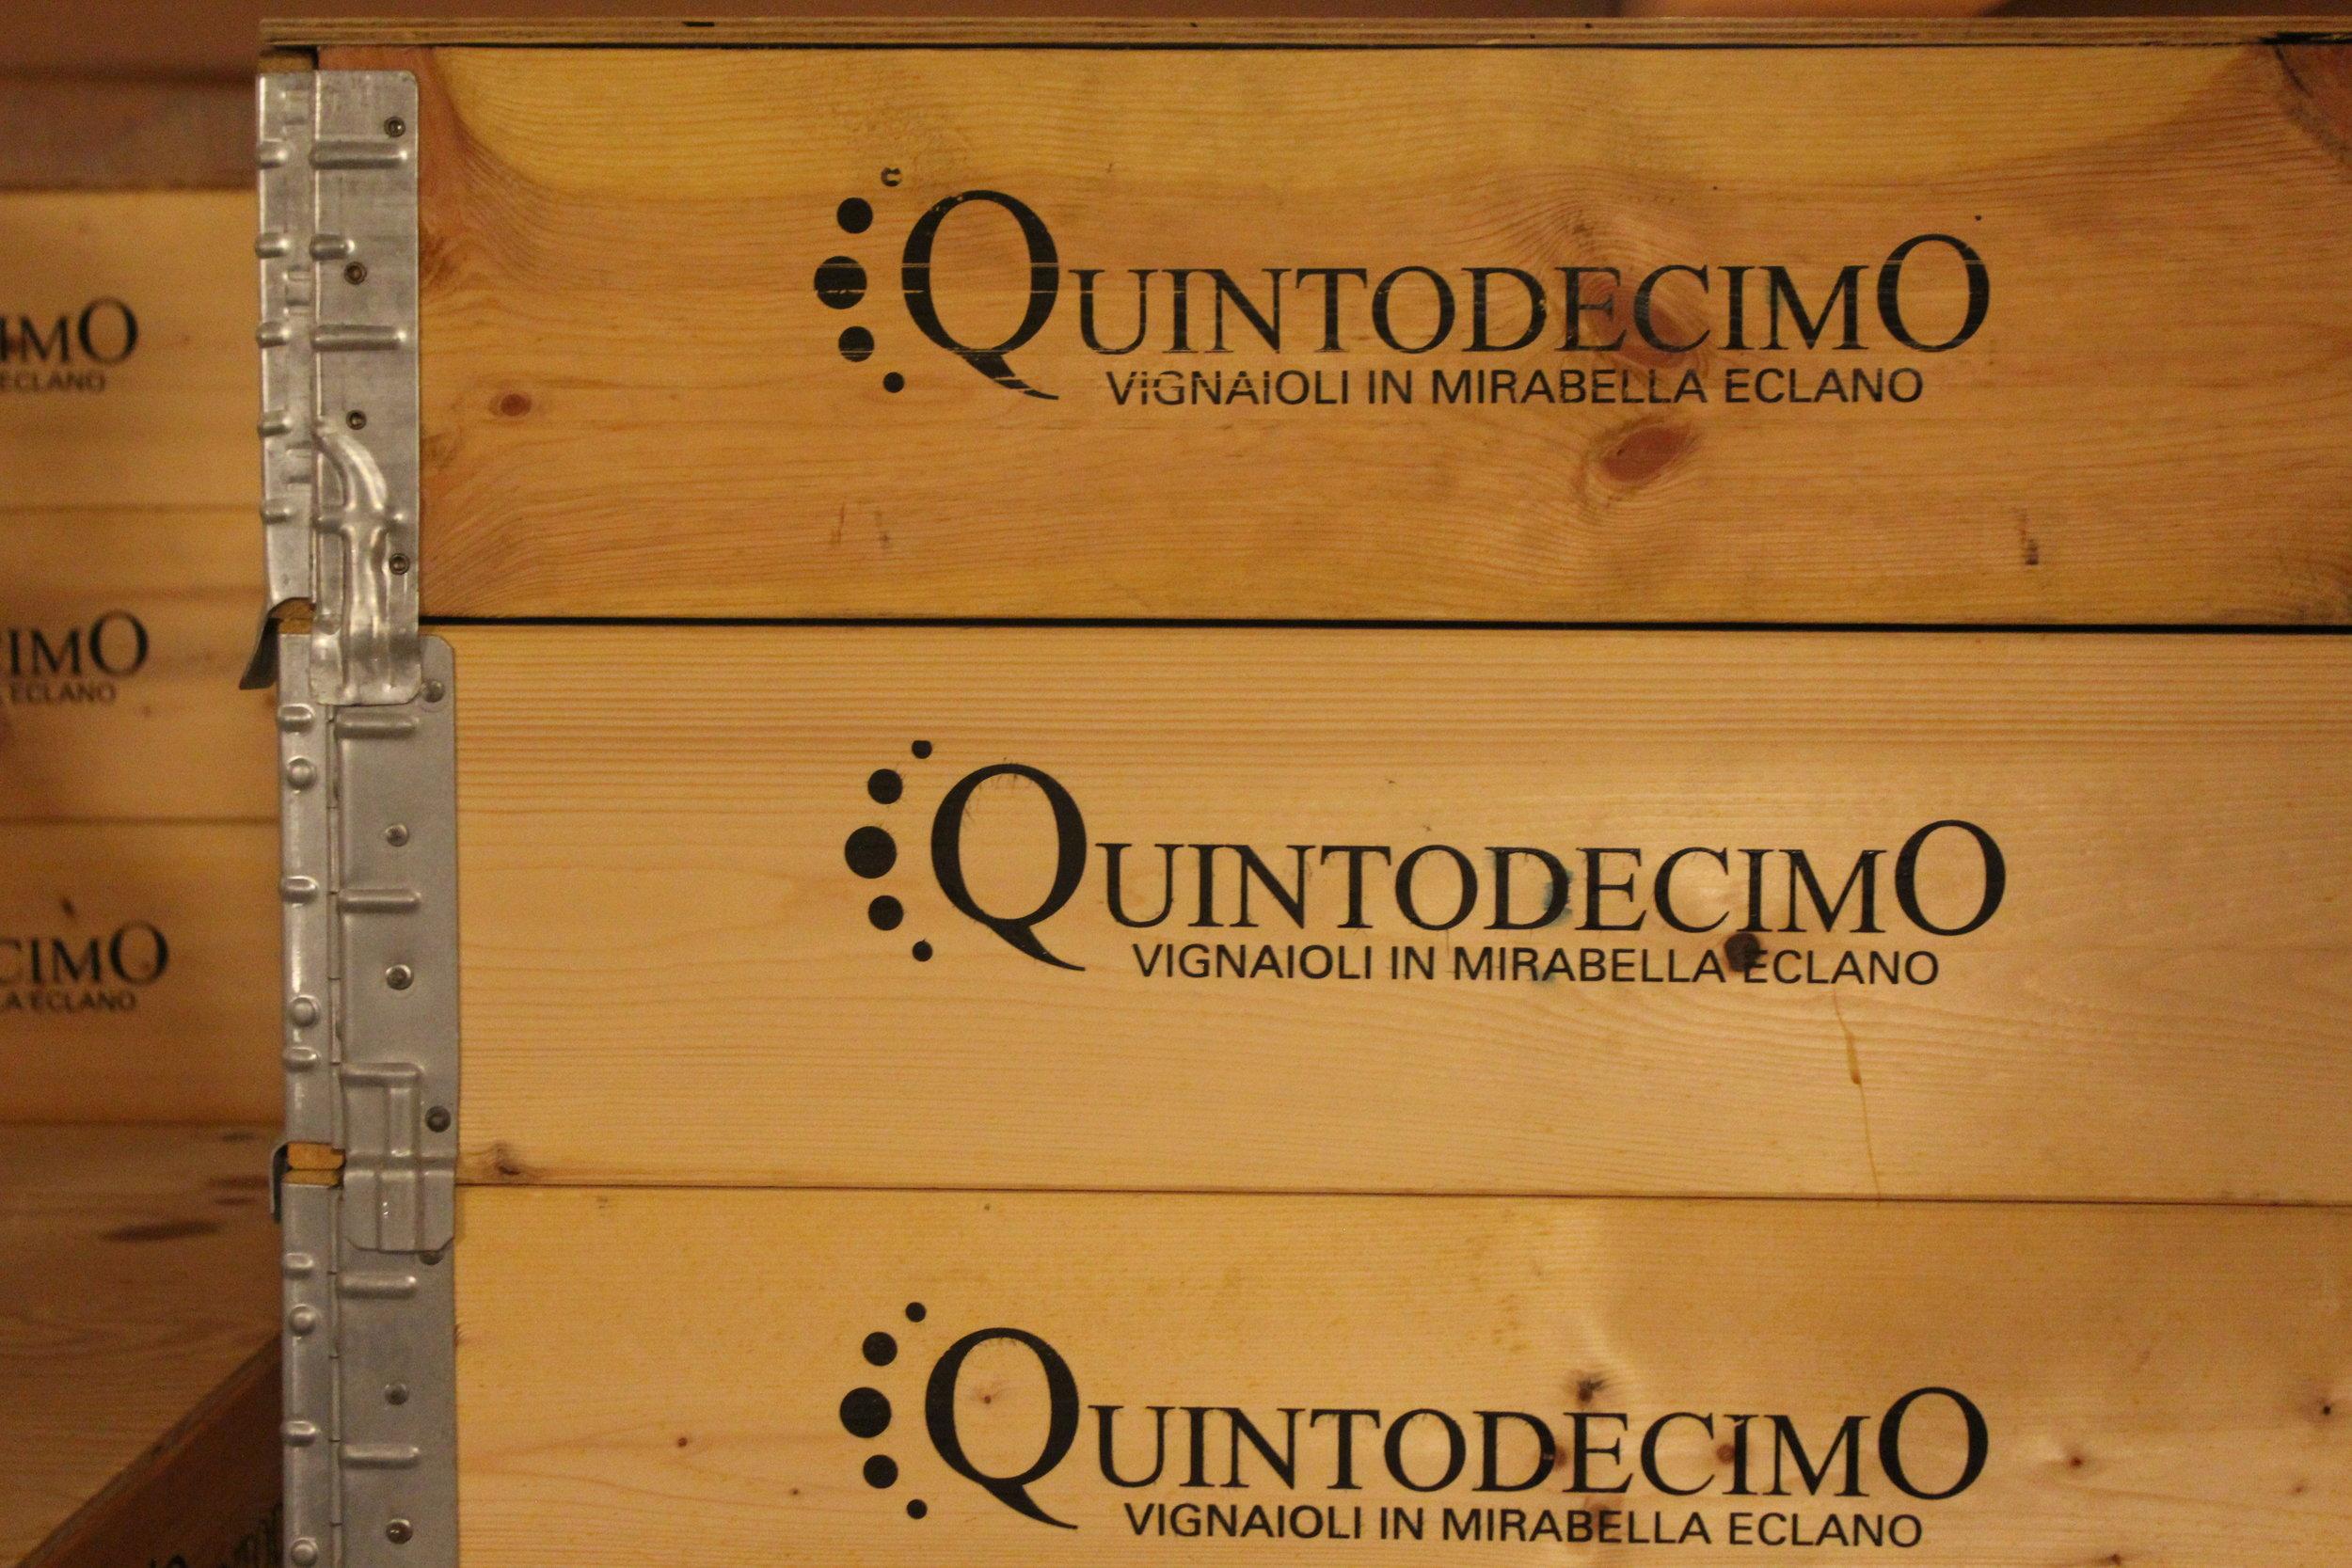 Luigi Moio's vineyard